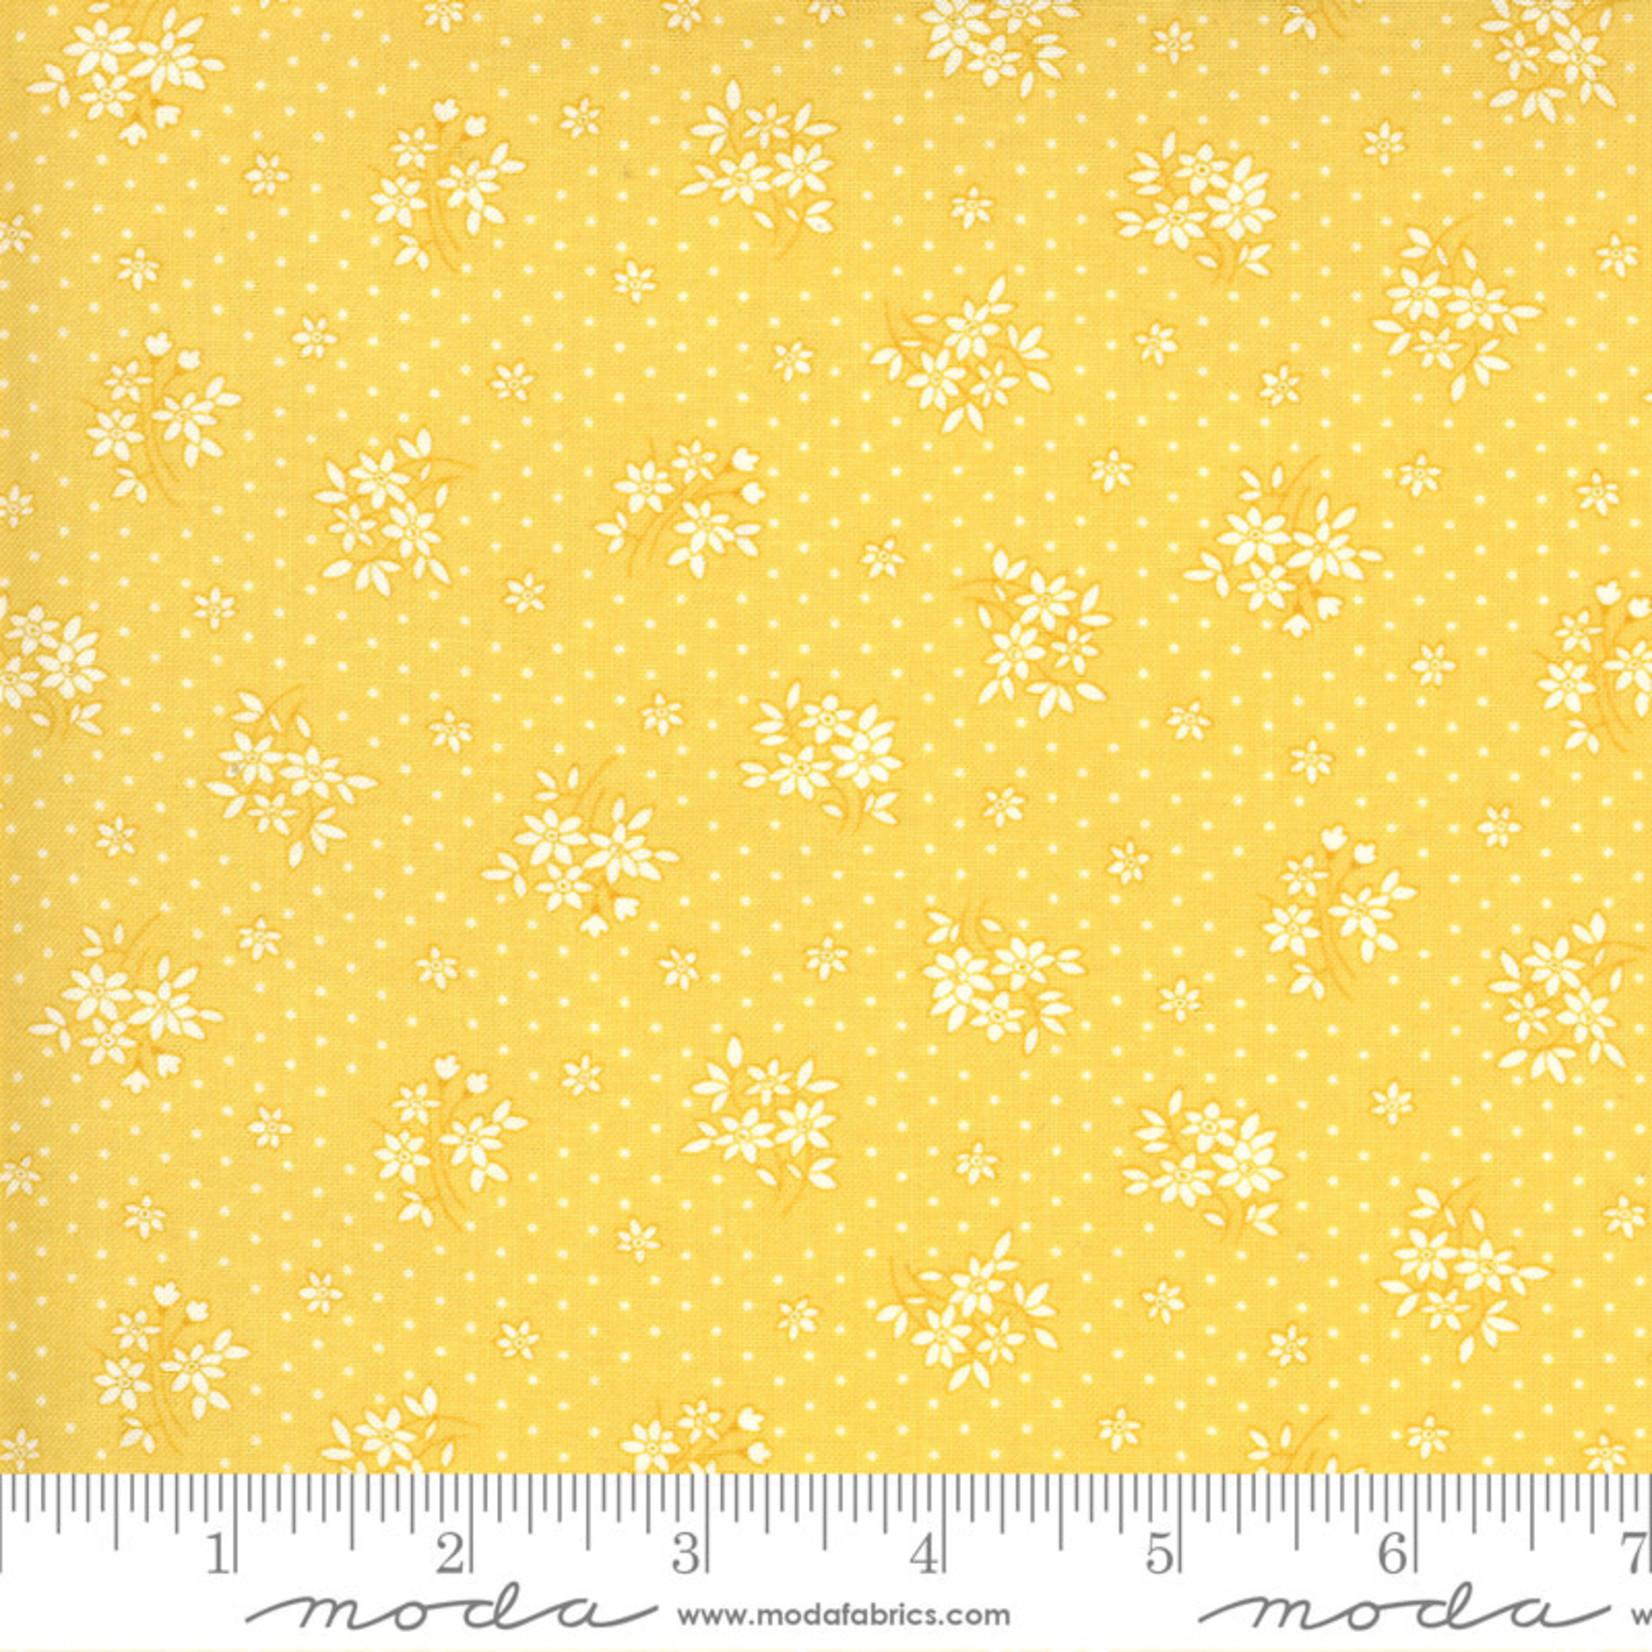 Chloe's Closet 30s Playtime, Bouquet Toss Floral, Buttercup 33595-14 $0.20 per cm or $20/m